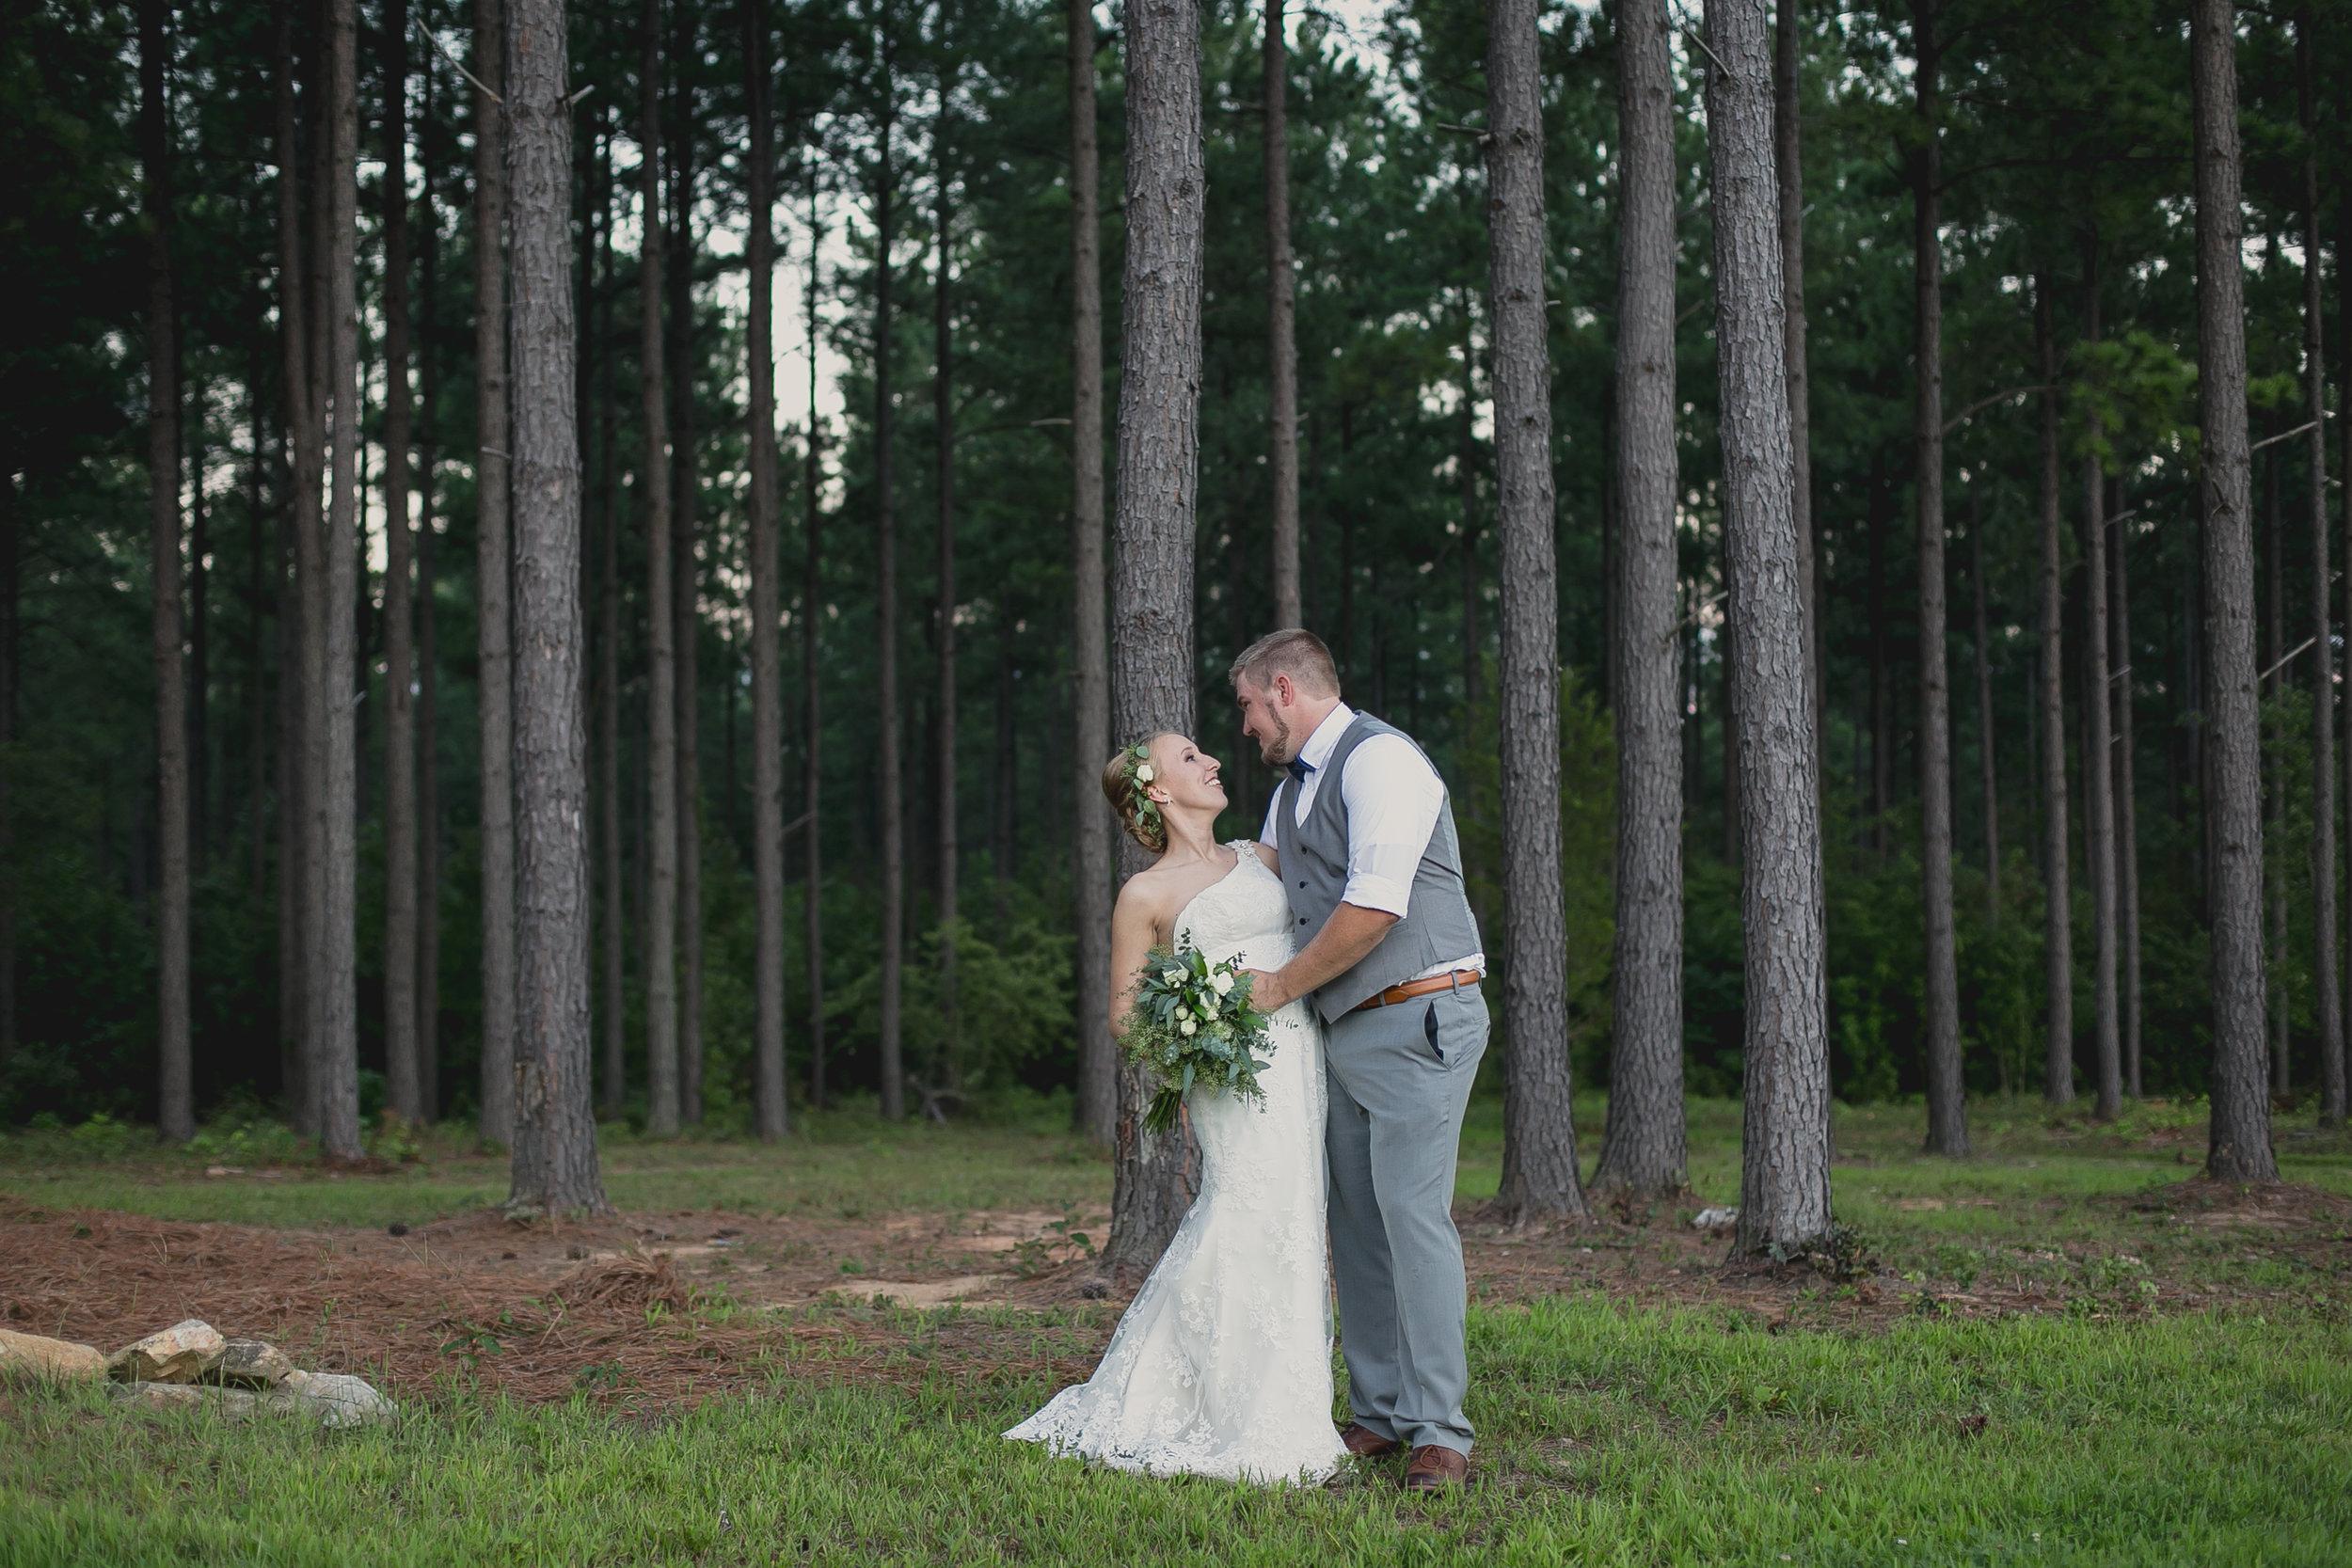 Luke_Sarah_Calaway_Wedding_12Aug17_1025.jpg